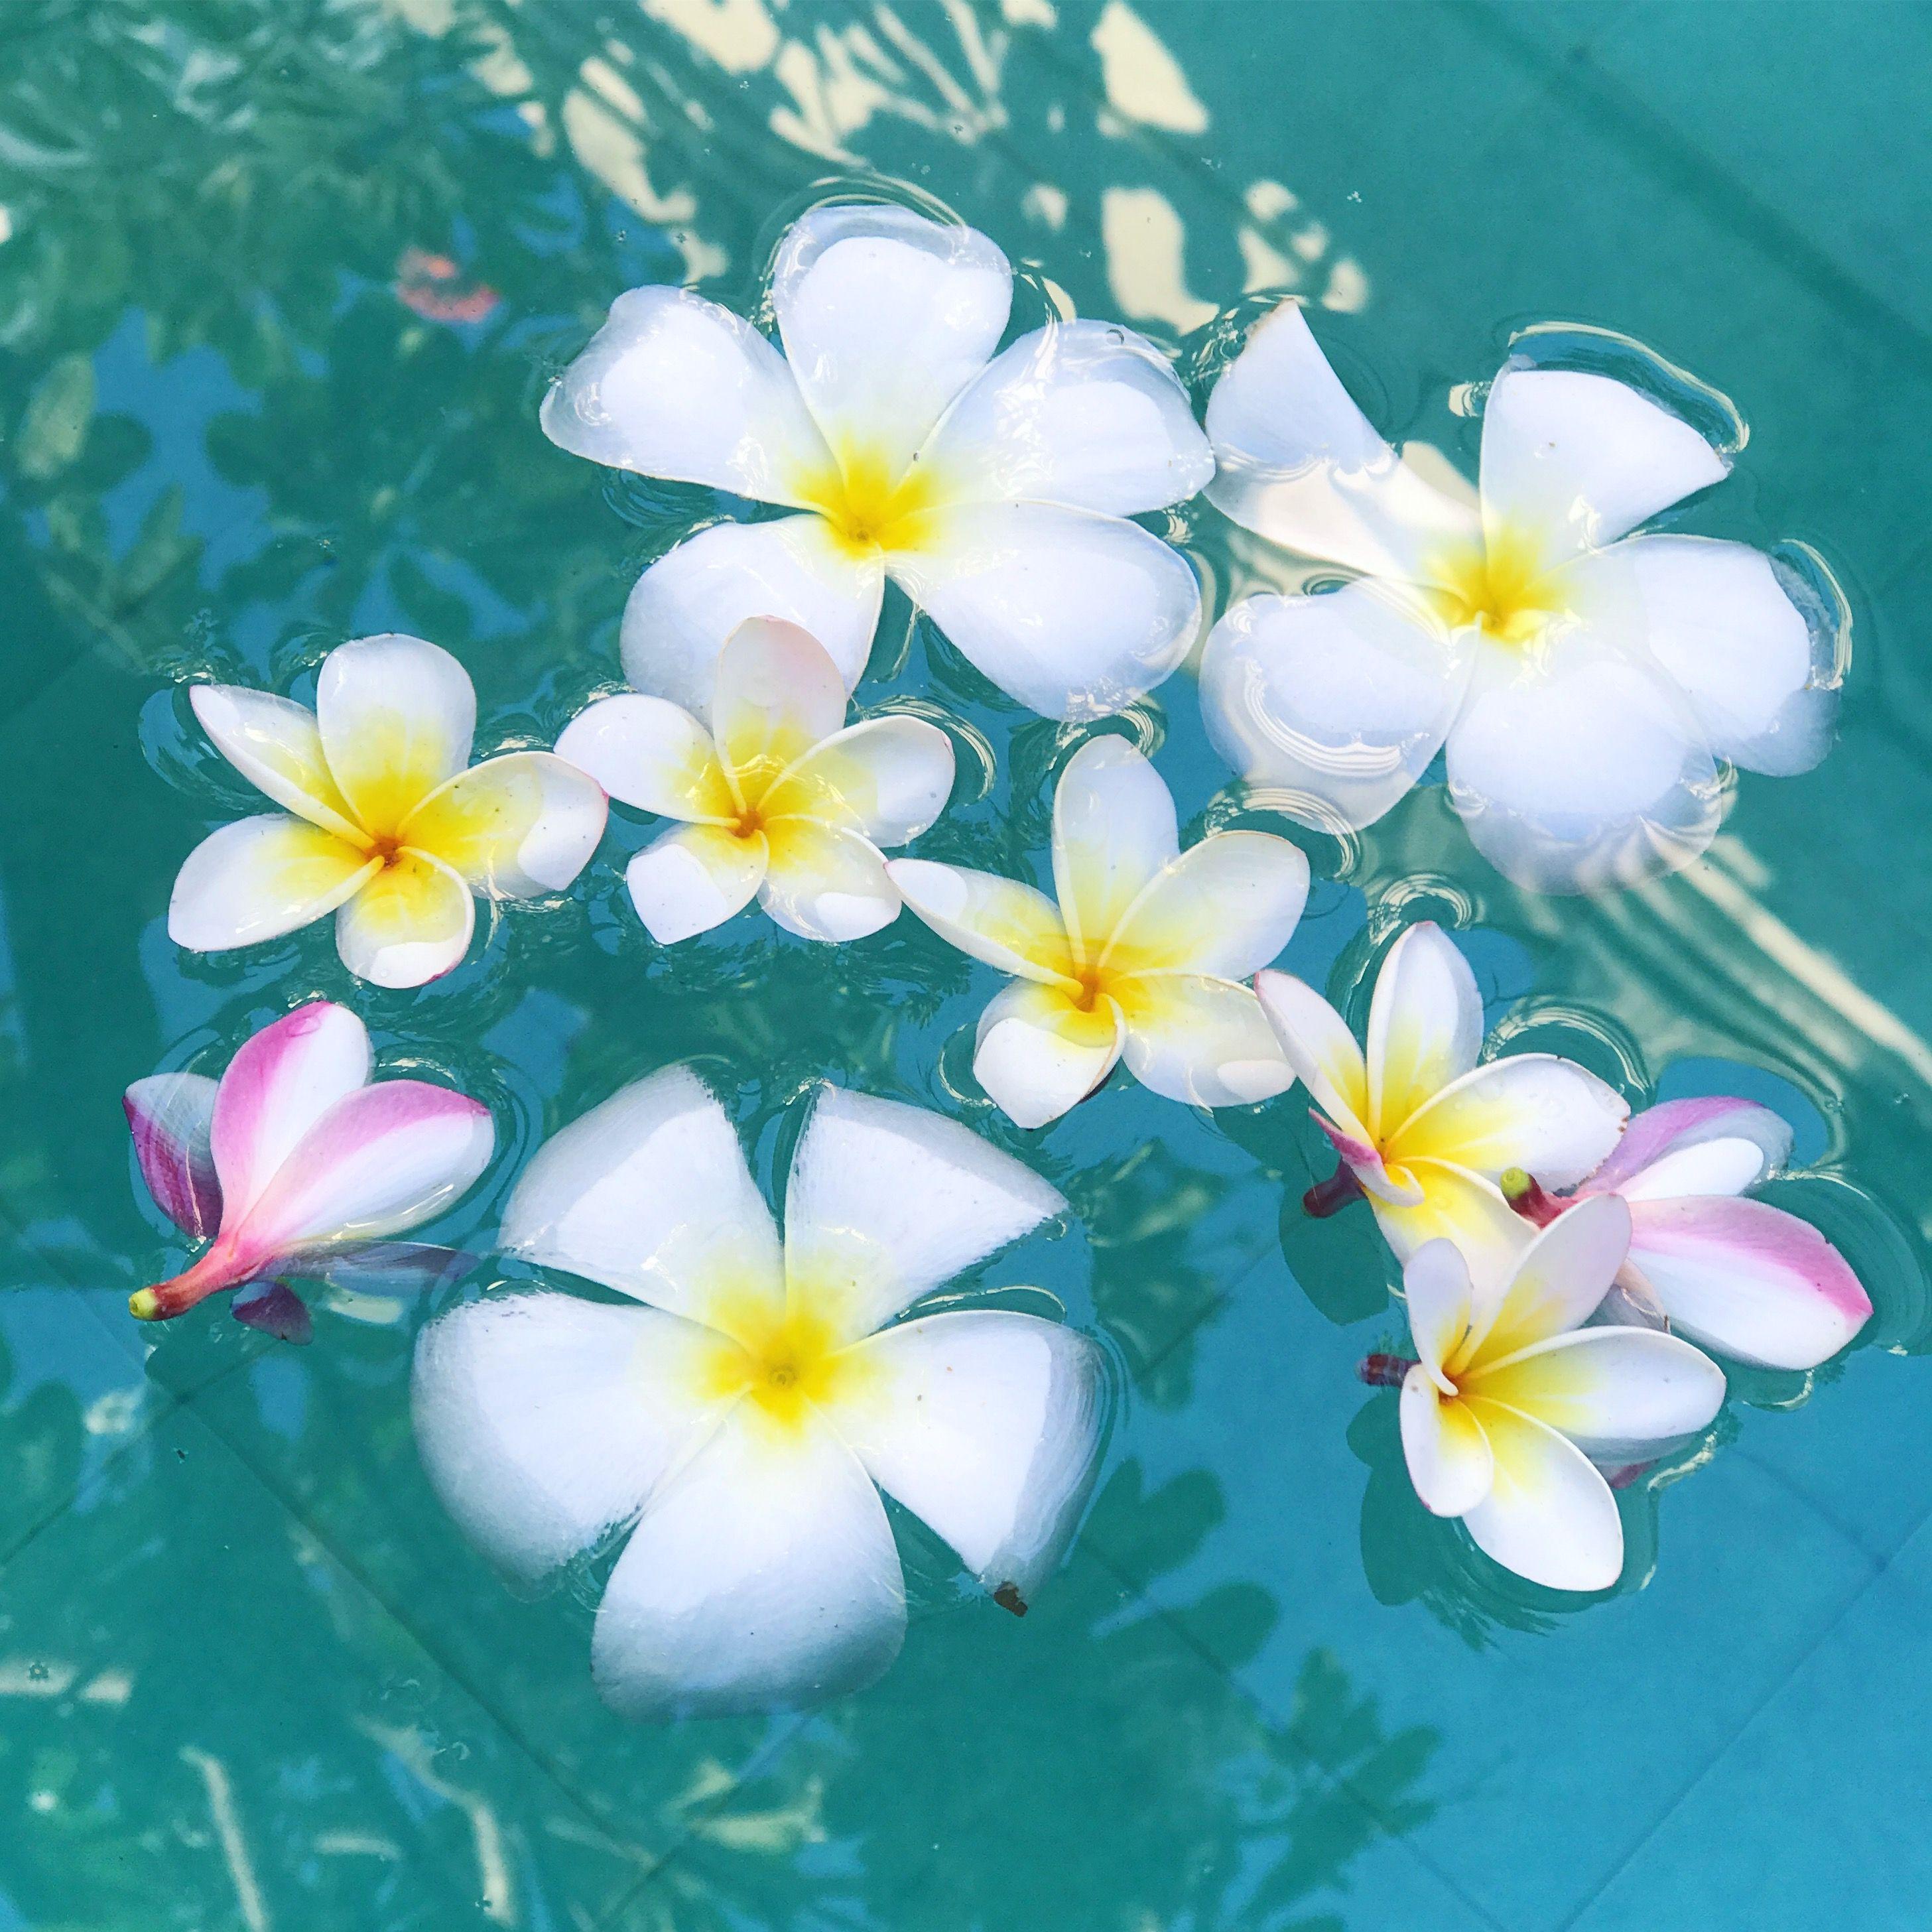 Plumeria 季節の生花種類 トロピカル 綺麗な絵